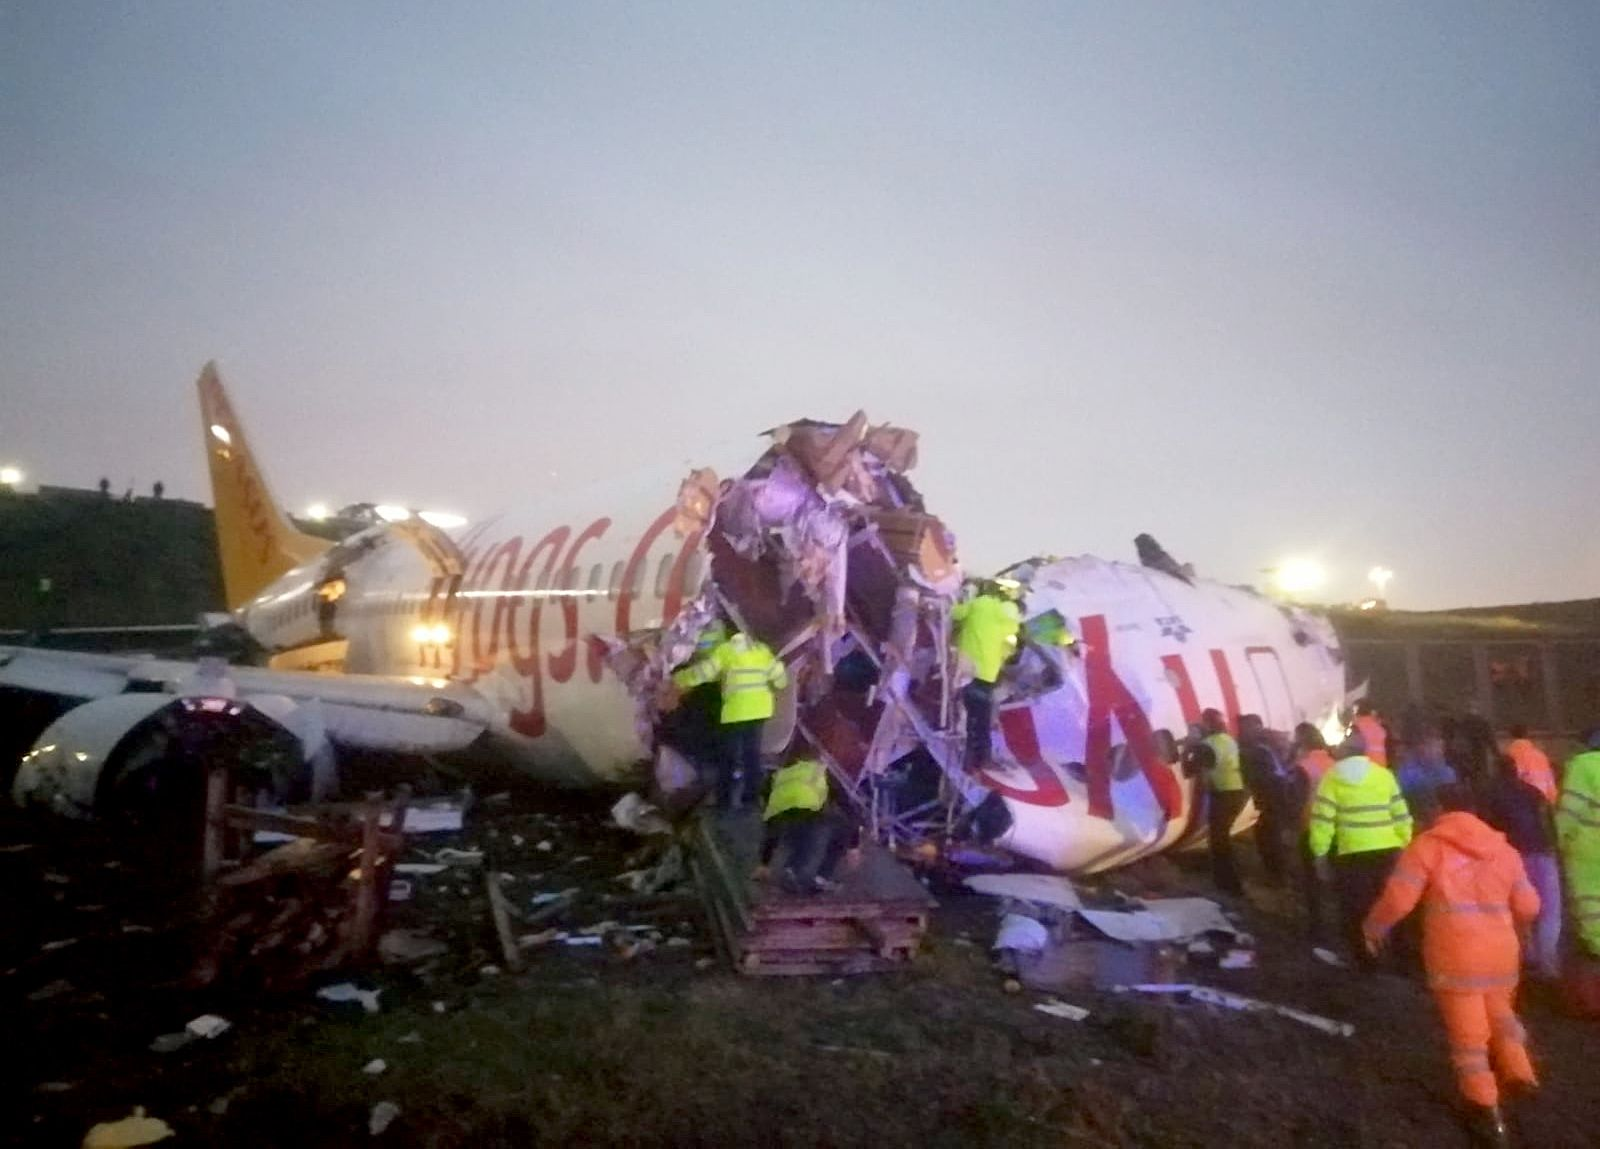 Turkey: Plane skids off runway in airport in Istanbul